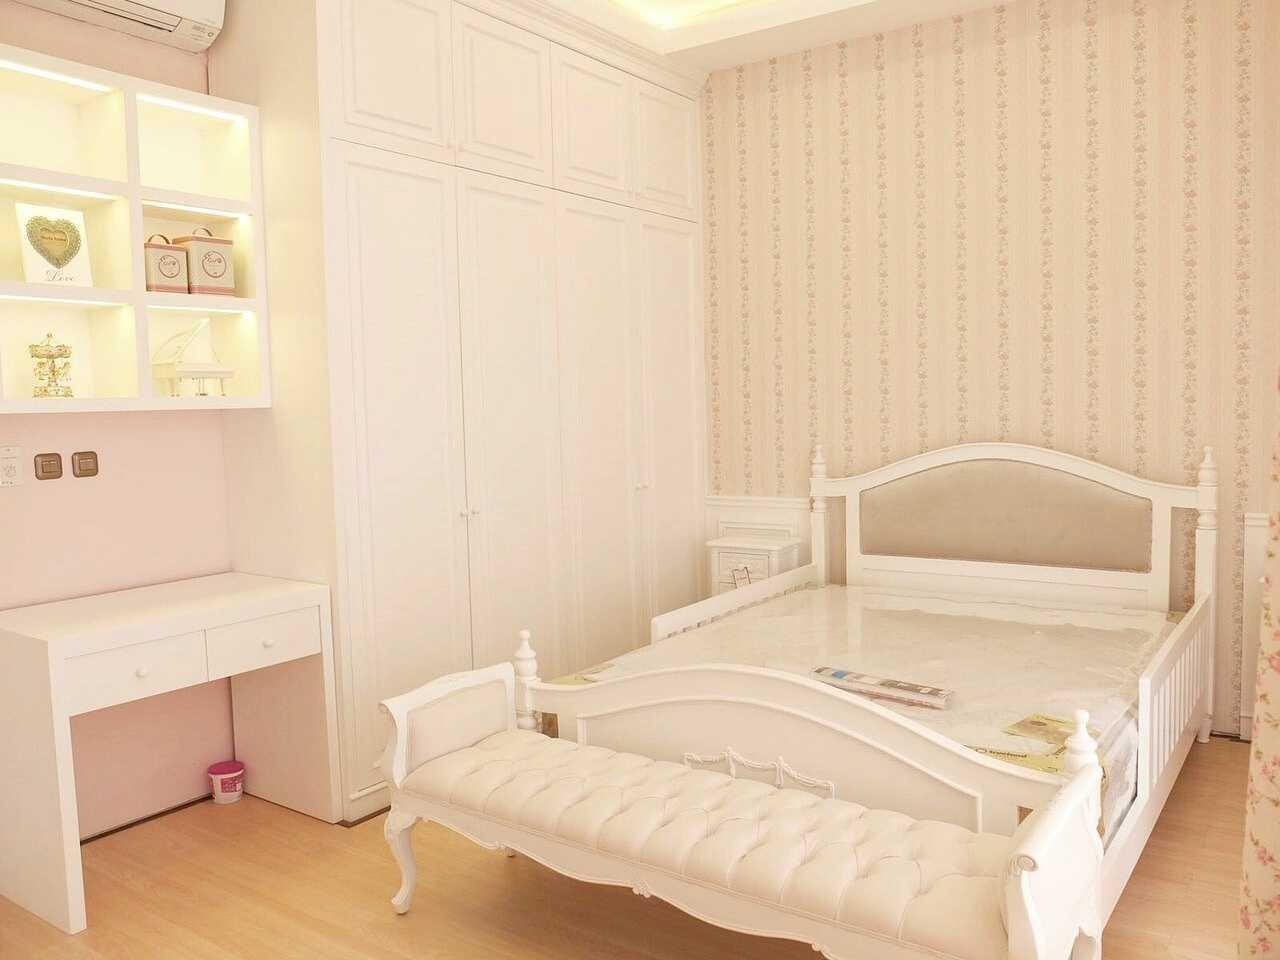 7Design Architect Mrs. D House Citrasun, Yogjakarta Citrasun, Yogjakarta Bedroom Area Klasik 18709